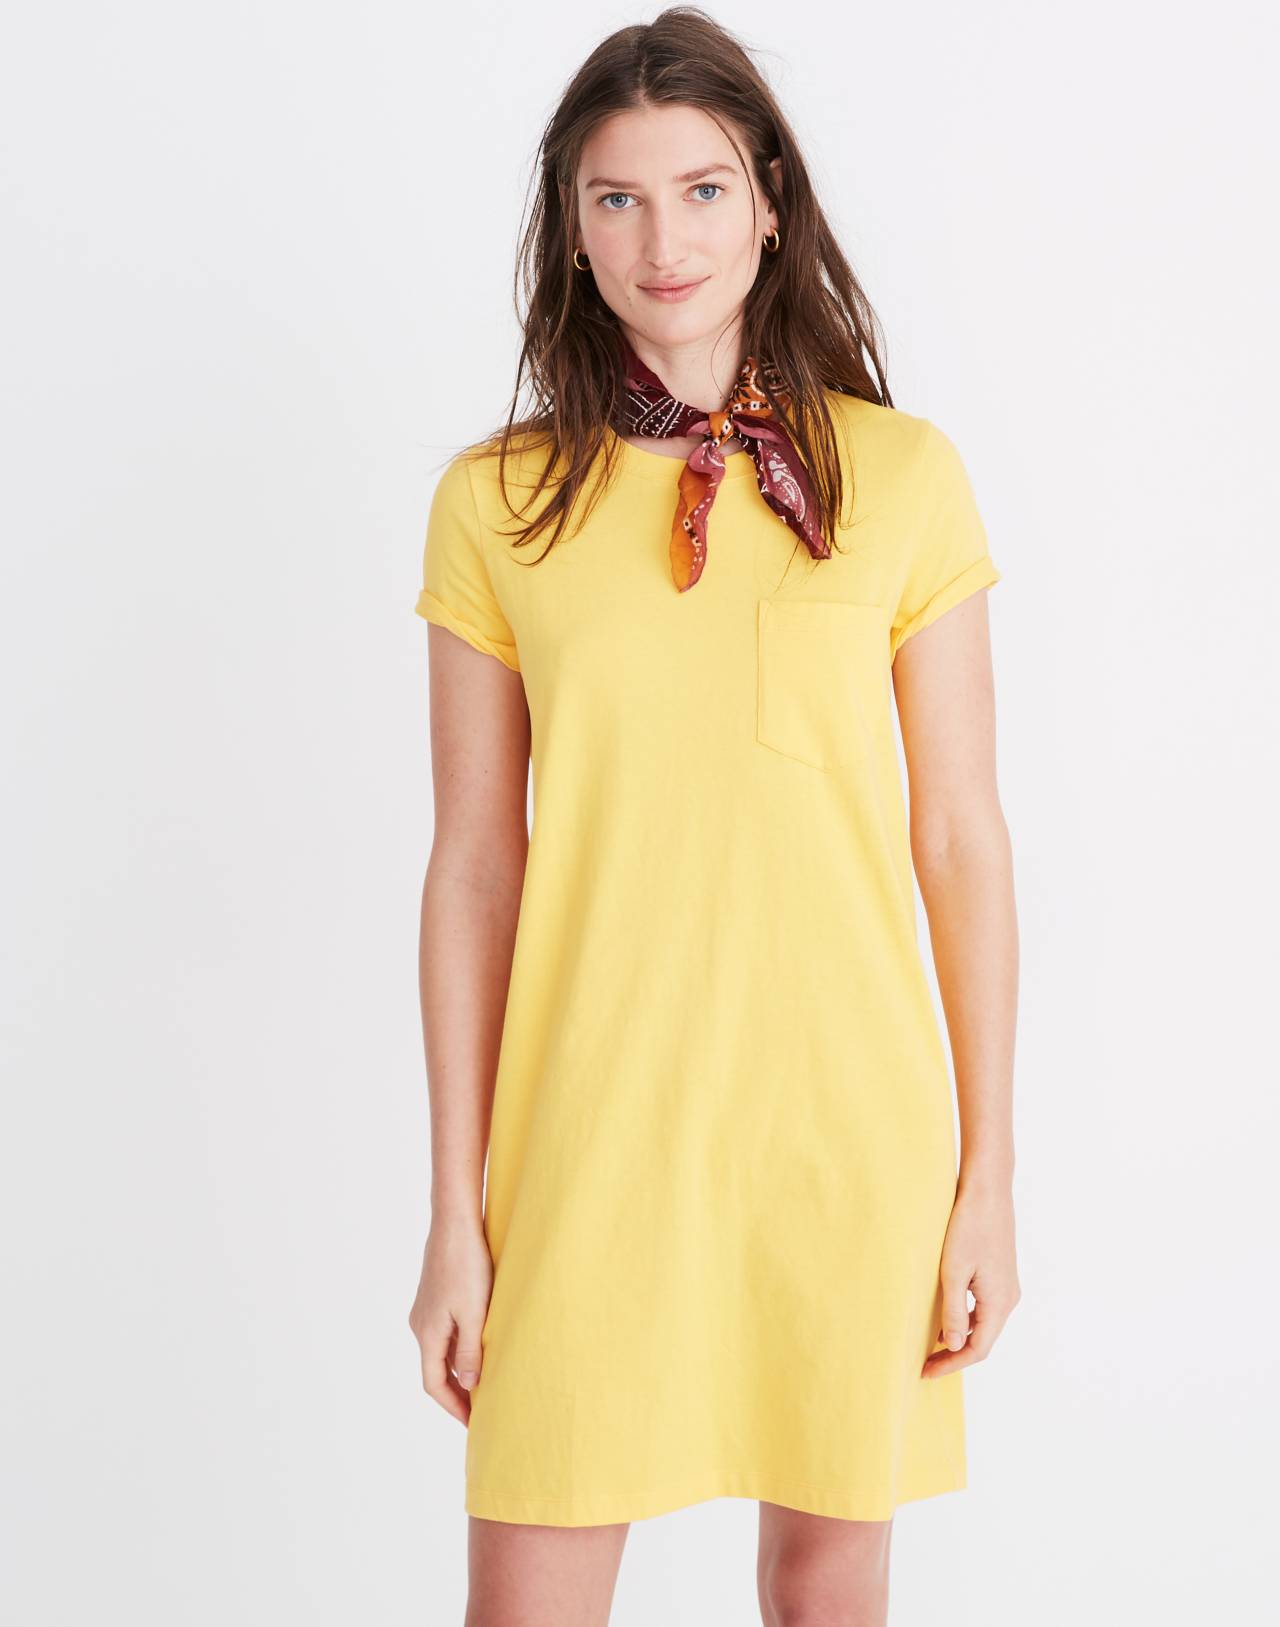 Tee Dress in golden lantern image 1